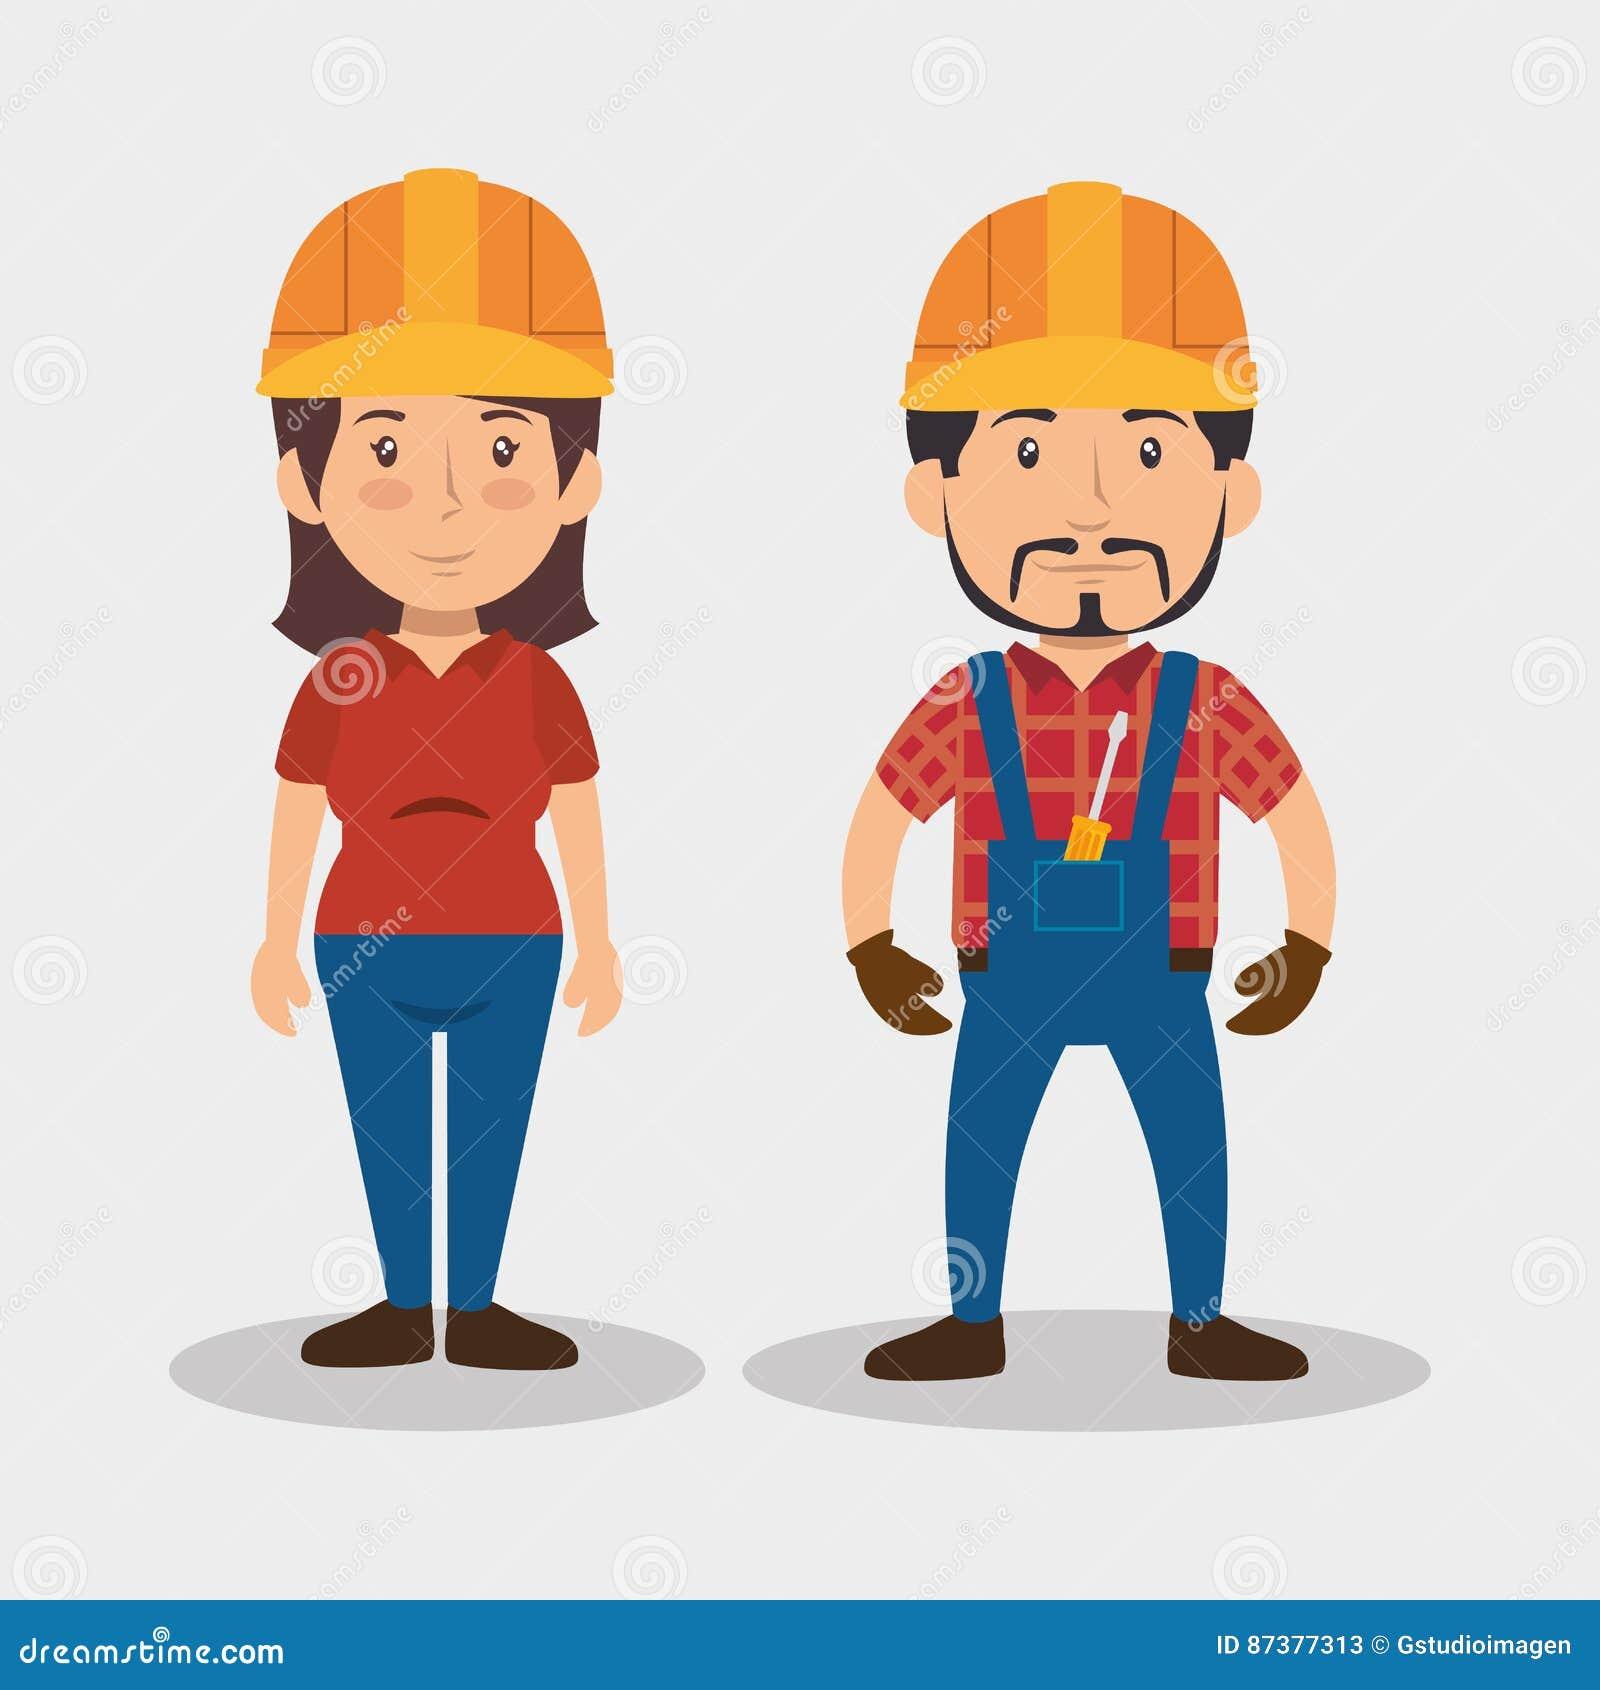 Budowy avatar fachowy charakter